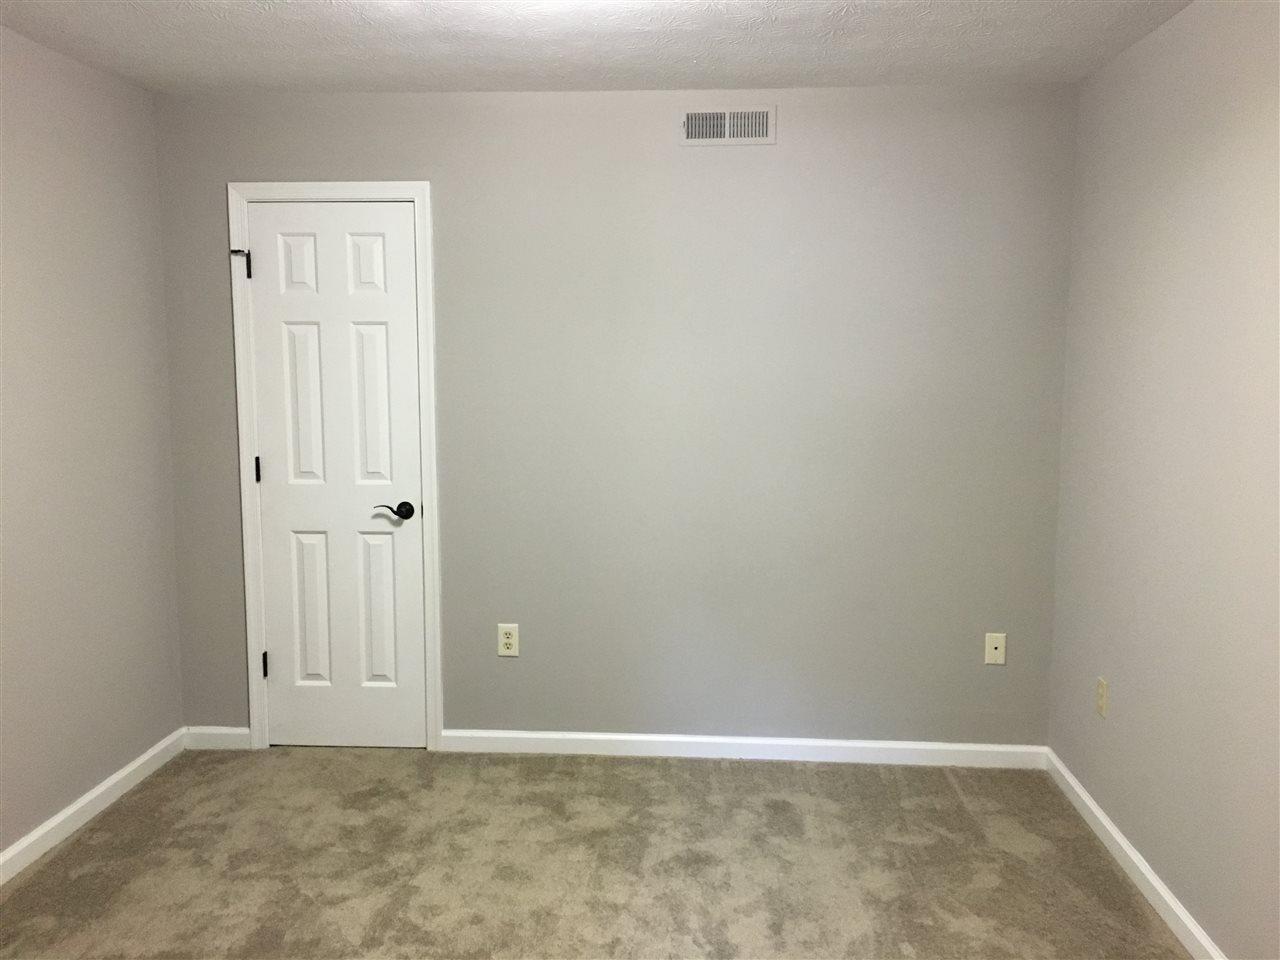 500 Grubert Ave, Staunton, VA, 24401